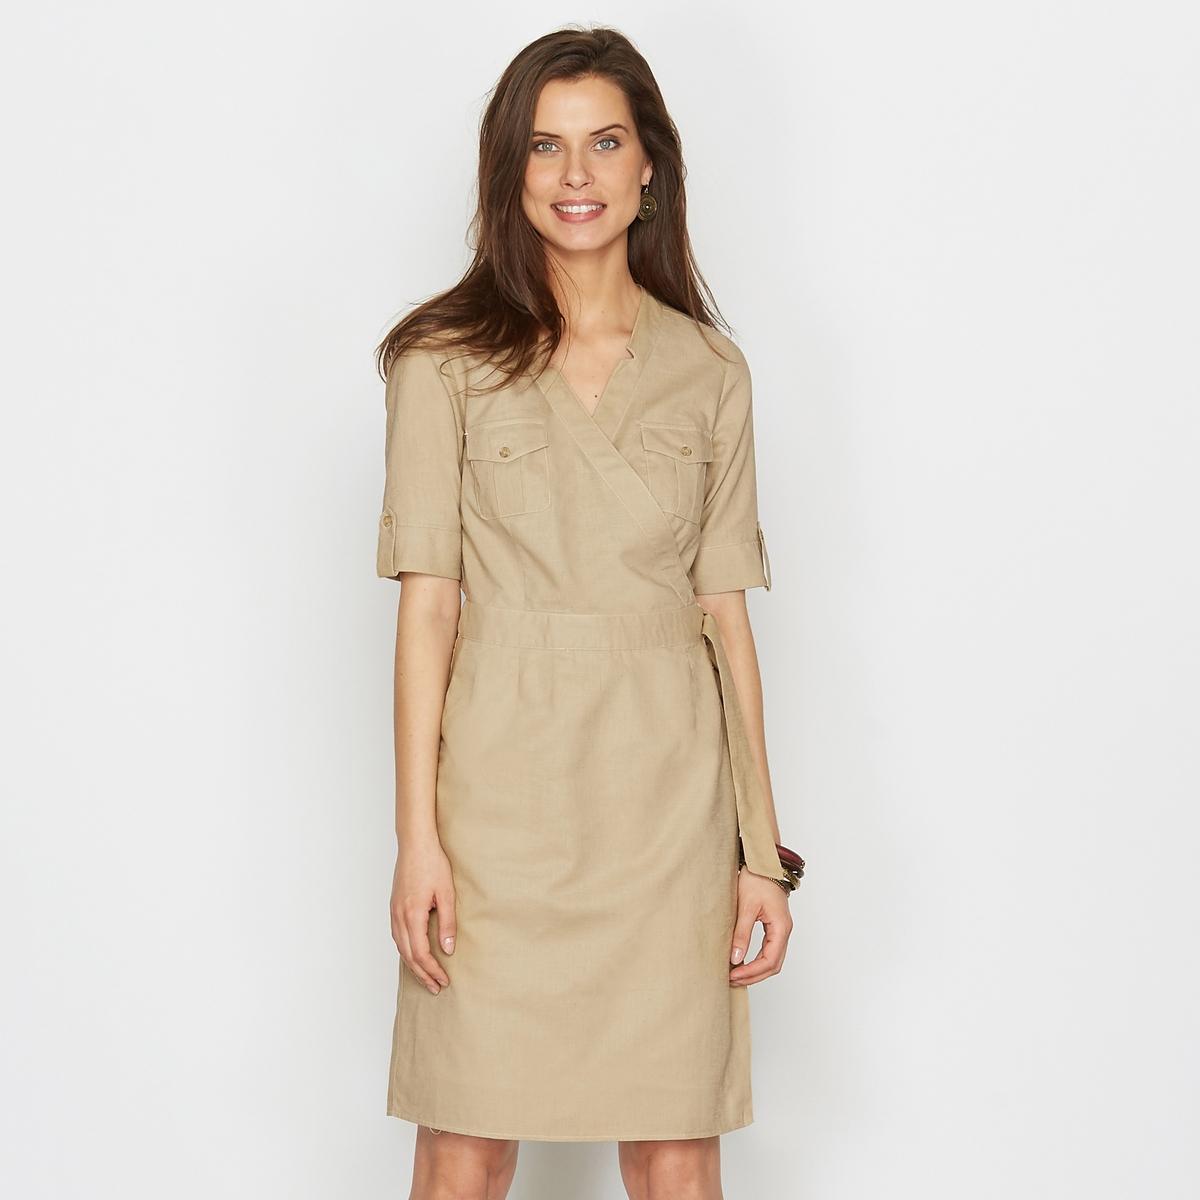 Платье с преобладанием льнаЭластичная, натуральная красивая ткань 55% льна, 45% хлопка .<br><br>Цвет: бежевый<br>Размер: 44 (FR) - 50 (RUS).48 (FR) - 54 (RUS).46 (FR) - 52 (RUS).42 (FR) - 48 (RUS)